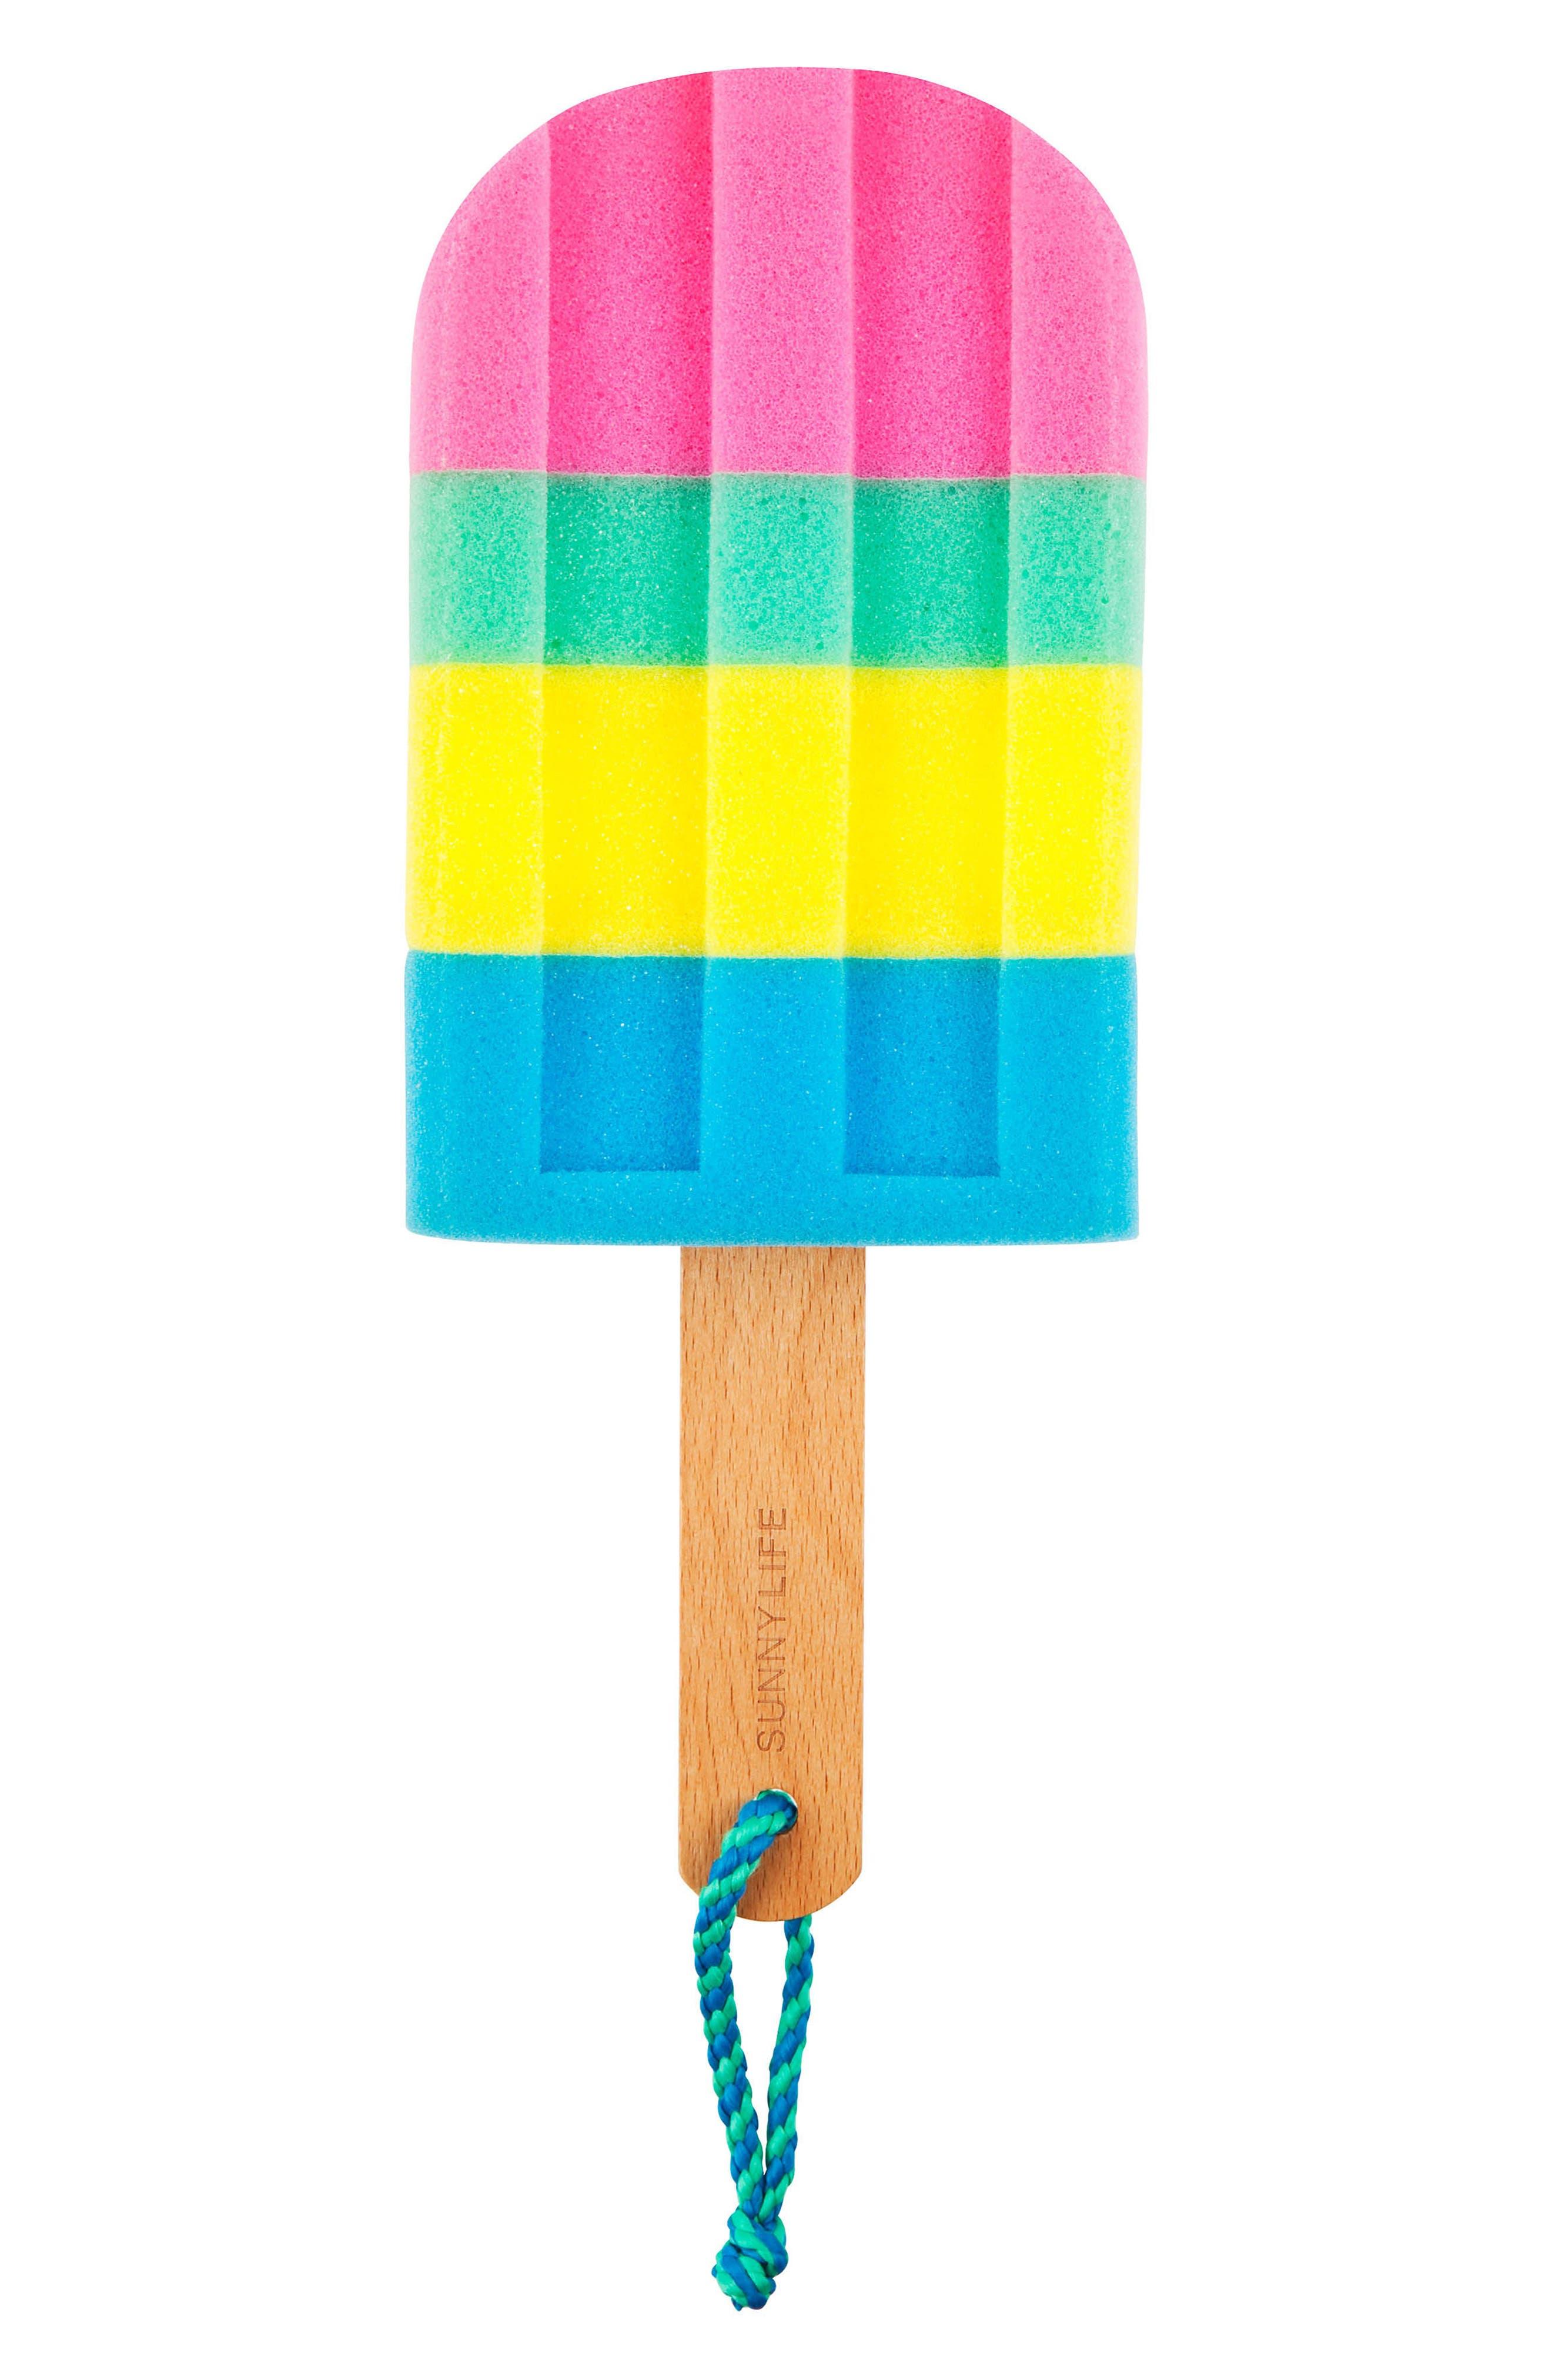 Ice Lolly Bath Sponge,                         Main,                         color, Blue